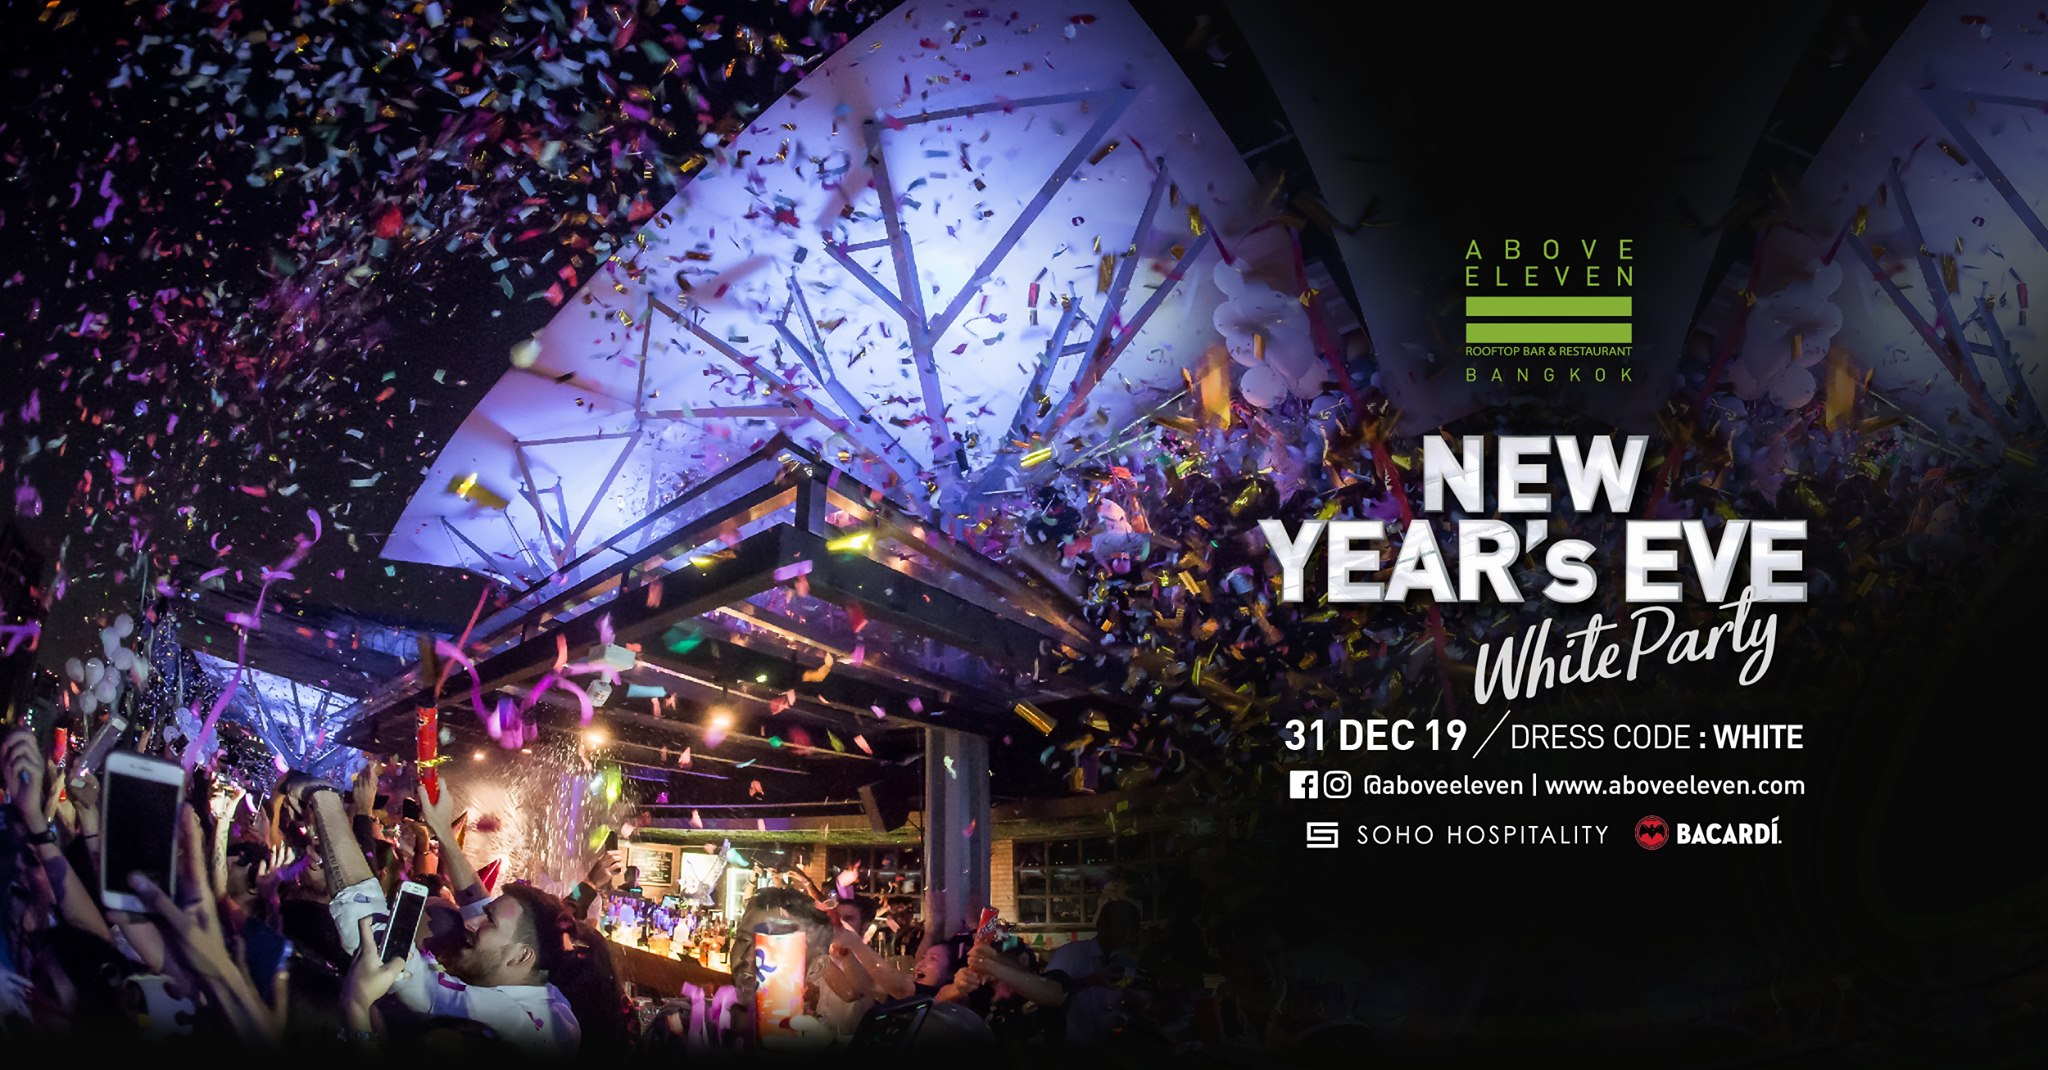 New Year's Eve 2020, celebration, new year, countdown party, countdown 2020 in bangkok, bangkok new year eve, above eleven, soho hospitality